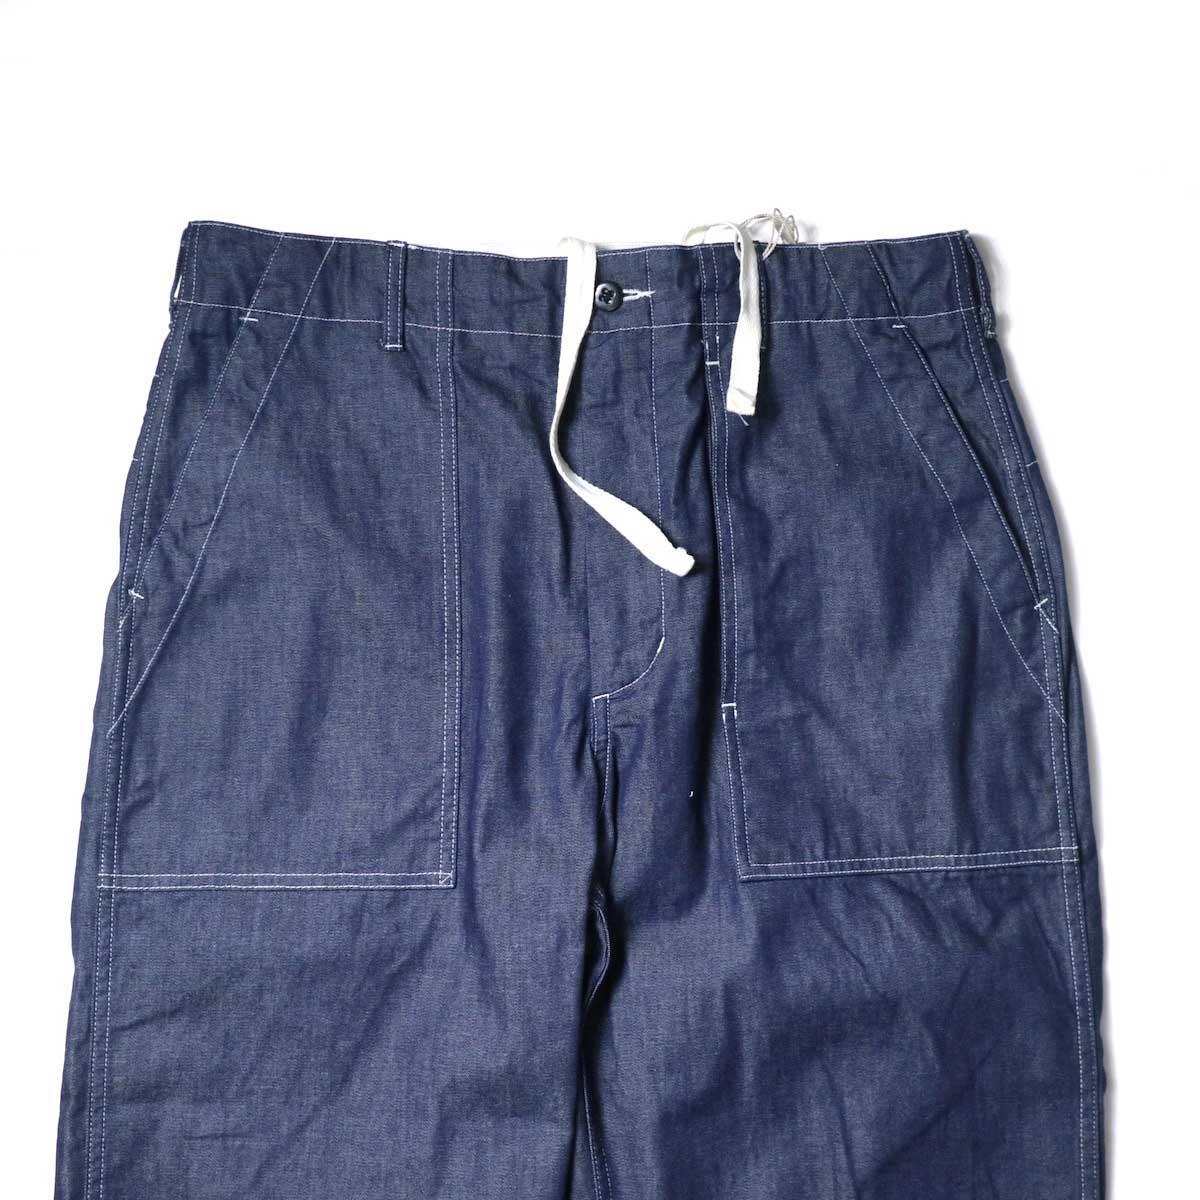 Engineered Garments / Fatigue Pant - 8oz Cone Denim (Indigo)ウエスト